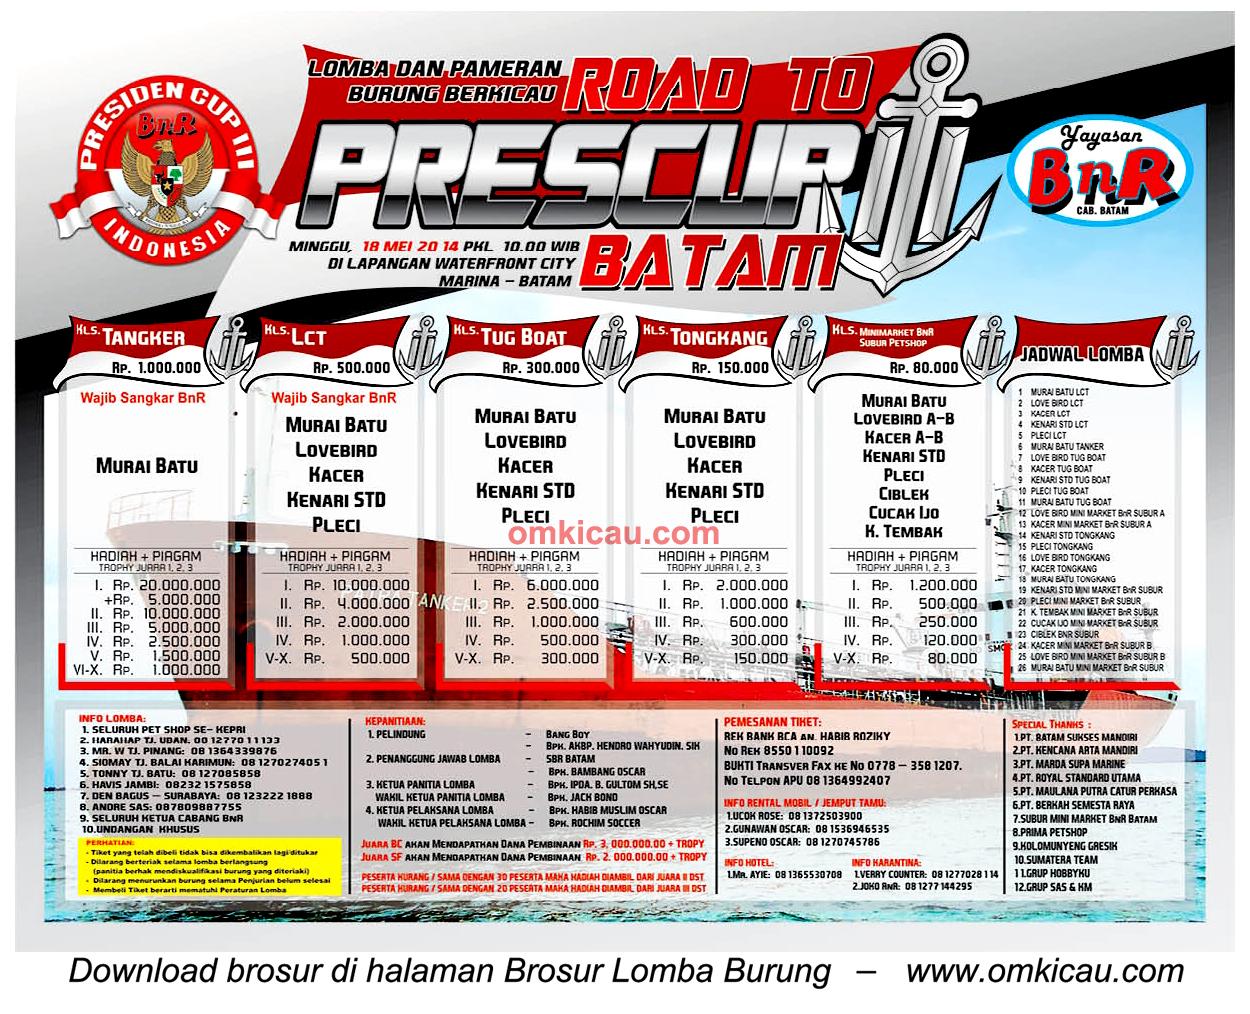 Brosur Lomba Burung Road to Presiden Cup III, Batam, 18 Mei 2014